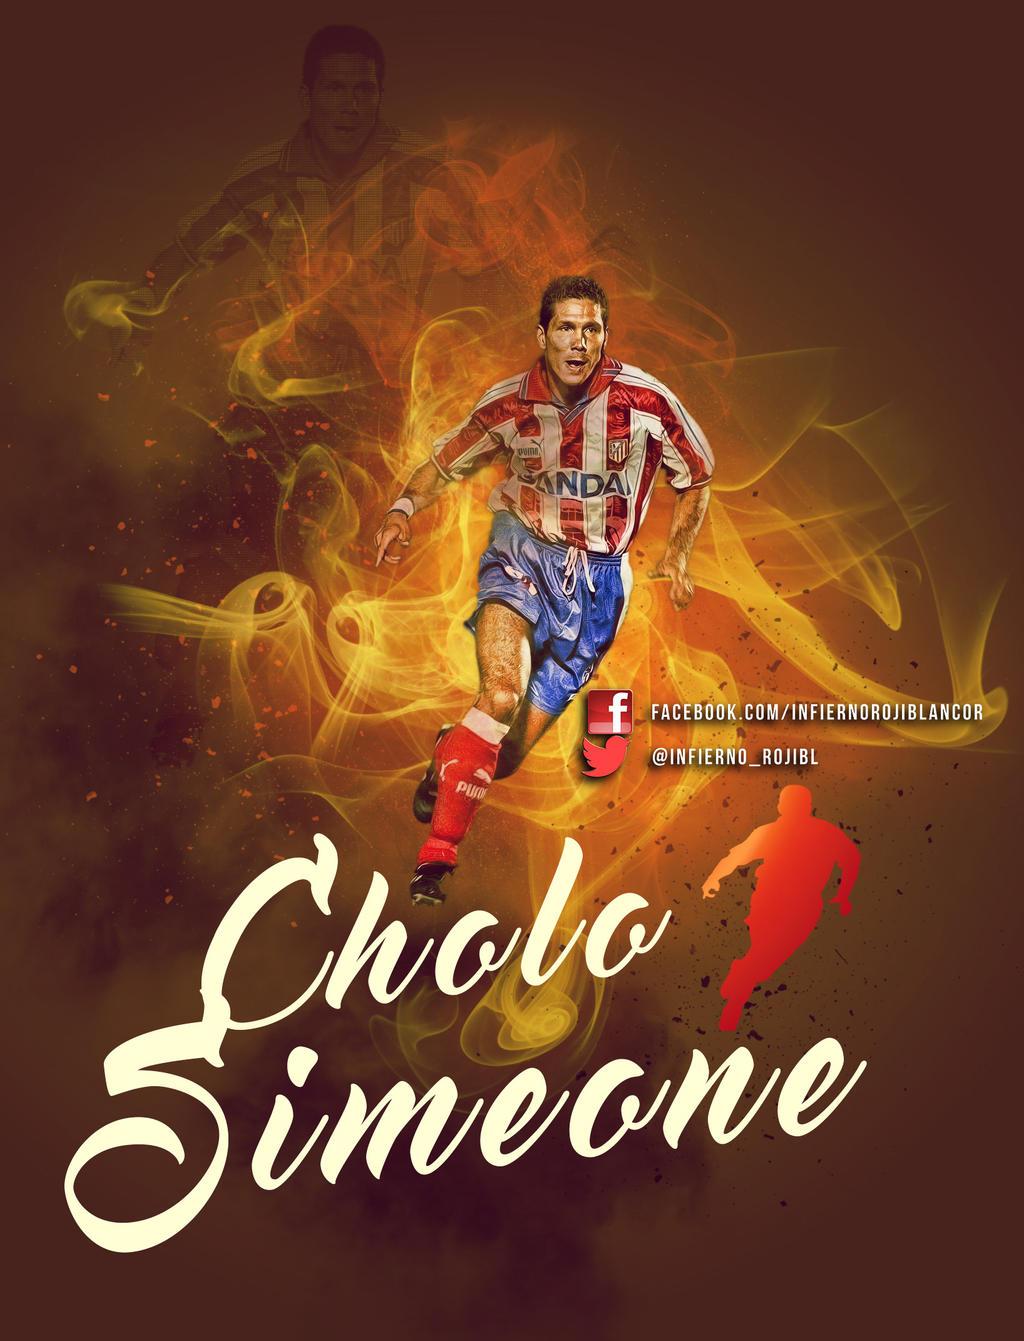 Cholo Simeone by InfiernoRojiblanco